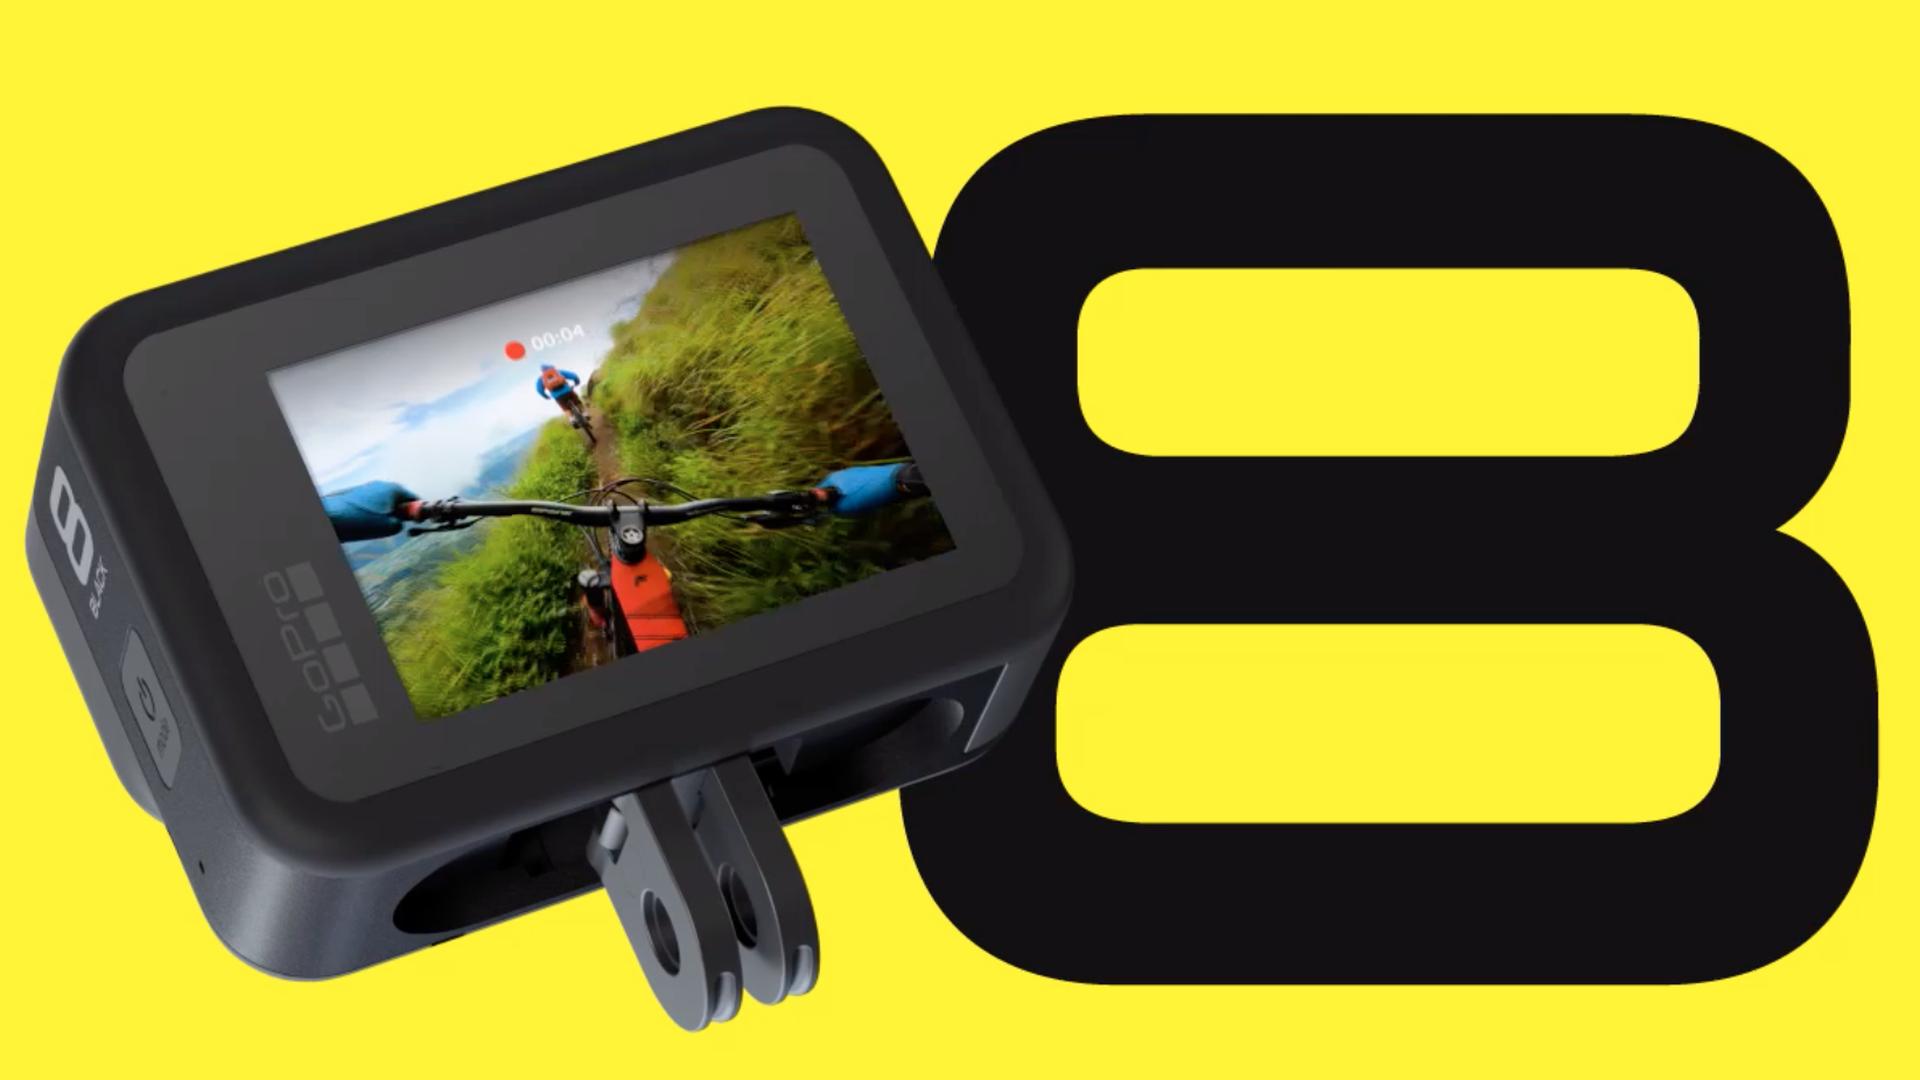 A go pro action camera